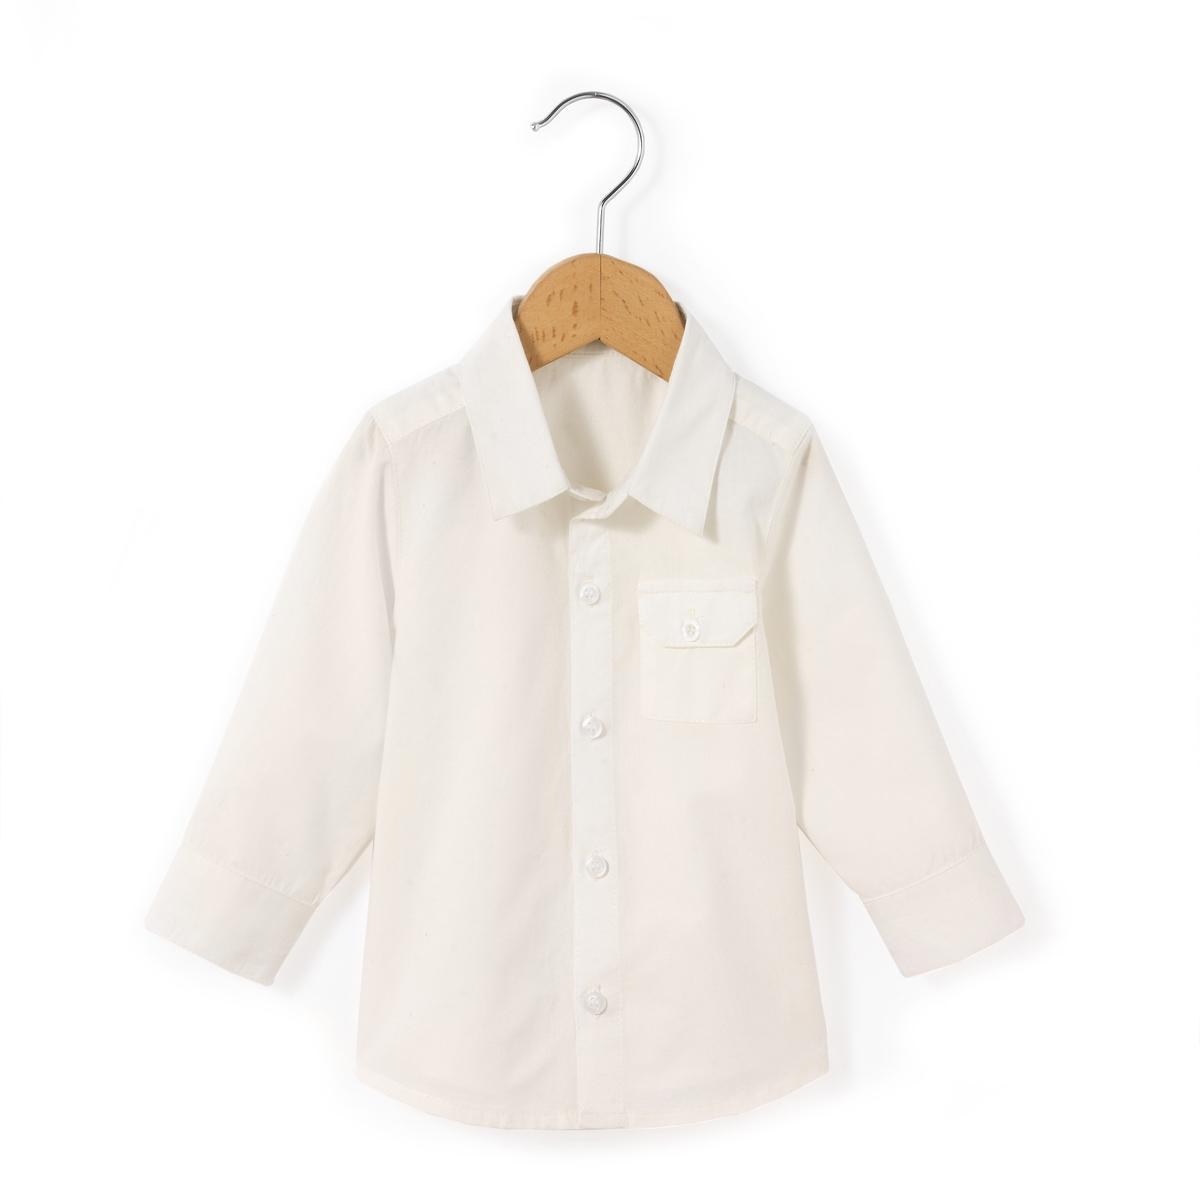 Рубашка однотонная,  1 мес.-3 года